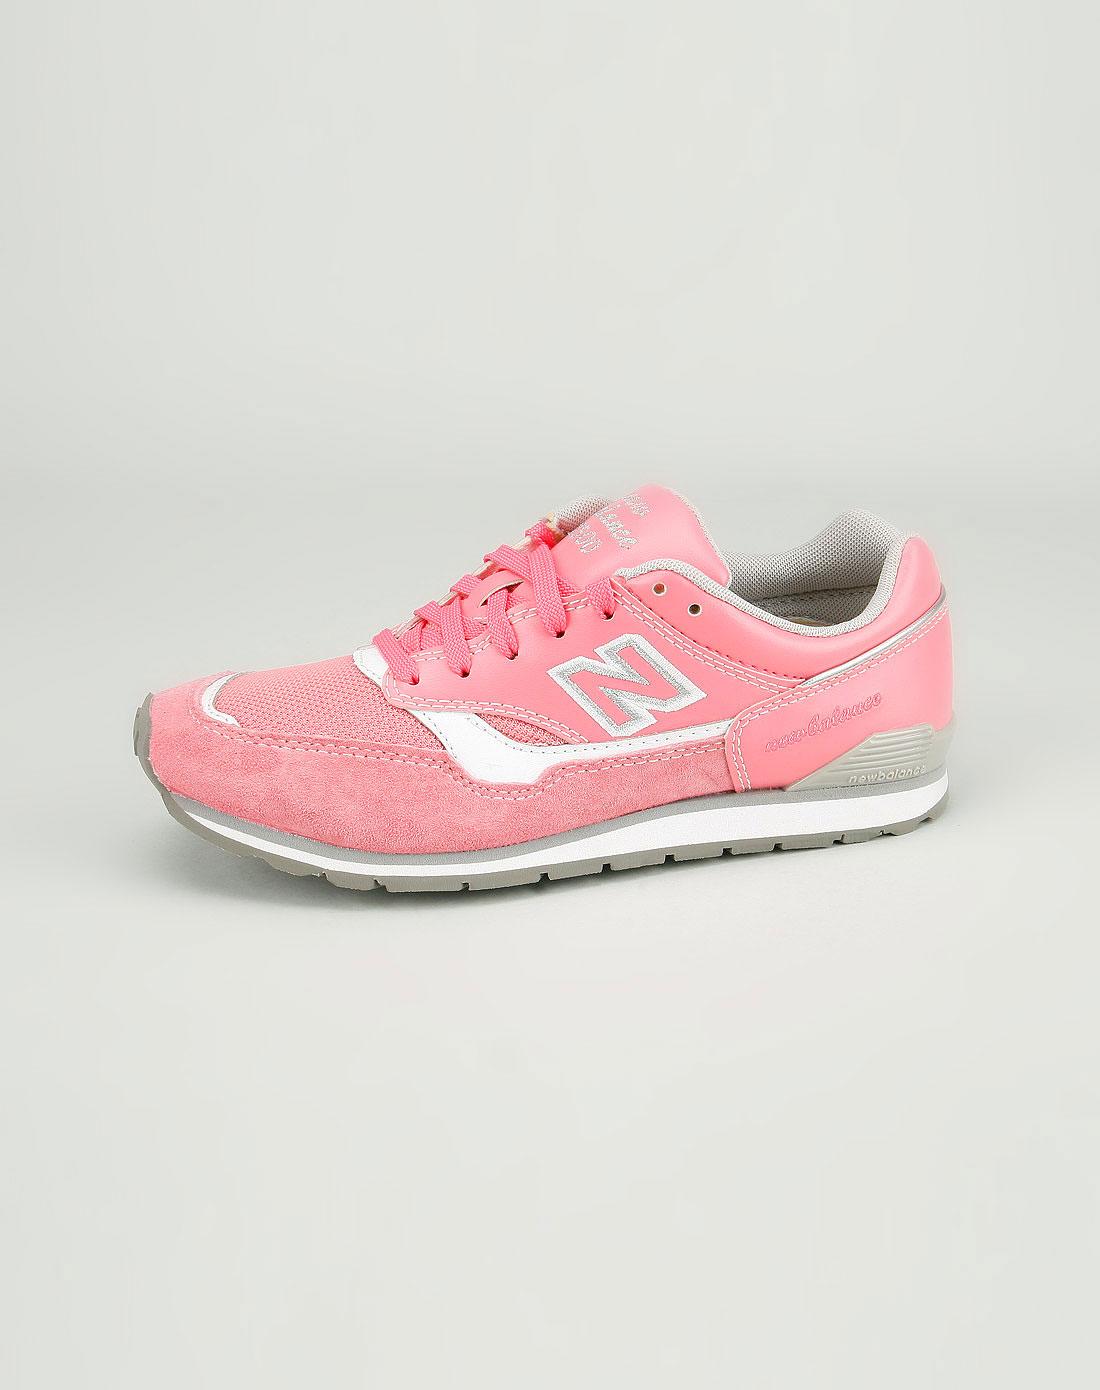 balance女款桃红色时尚运动鞋rc1500ro00d